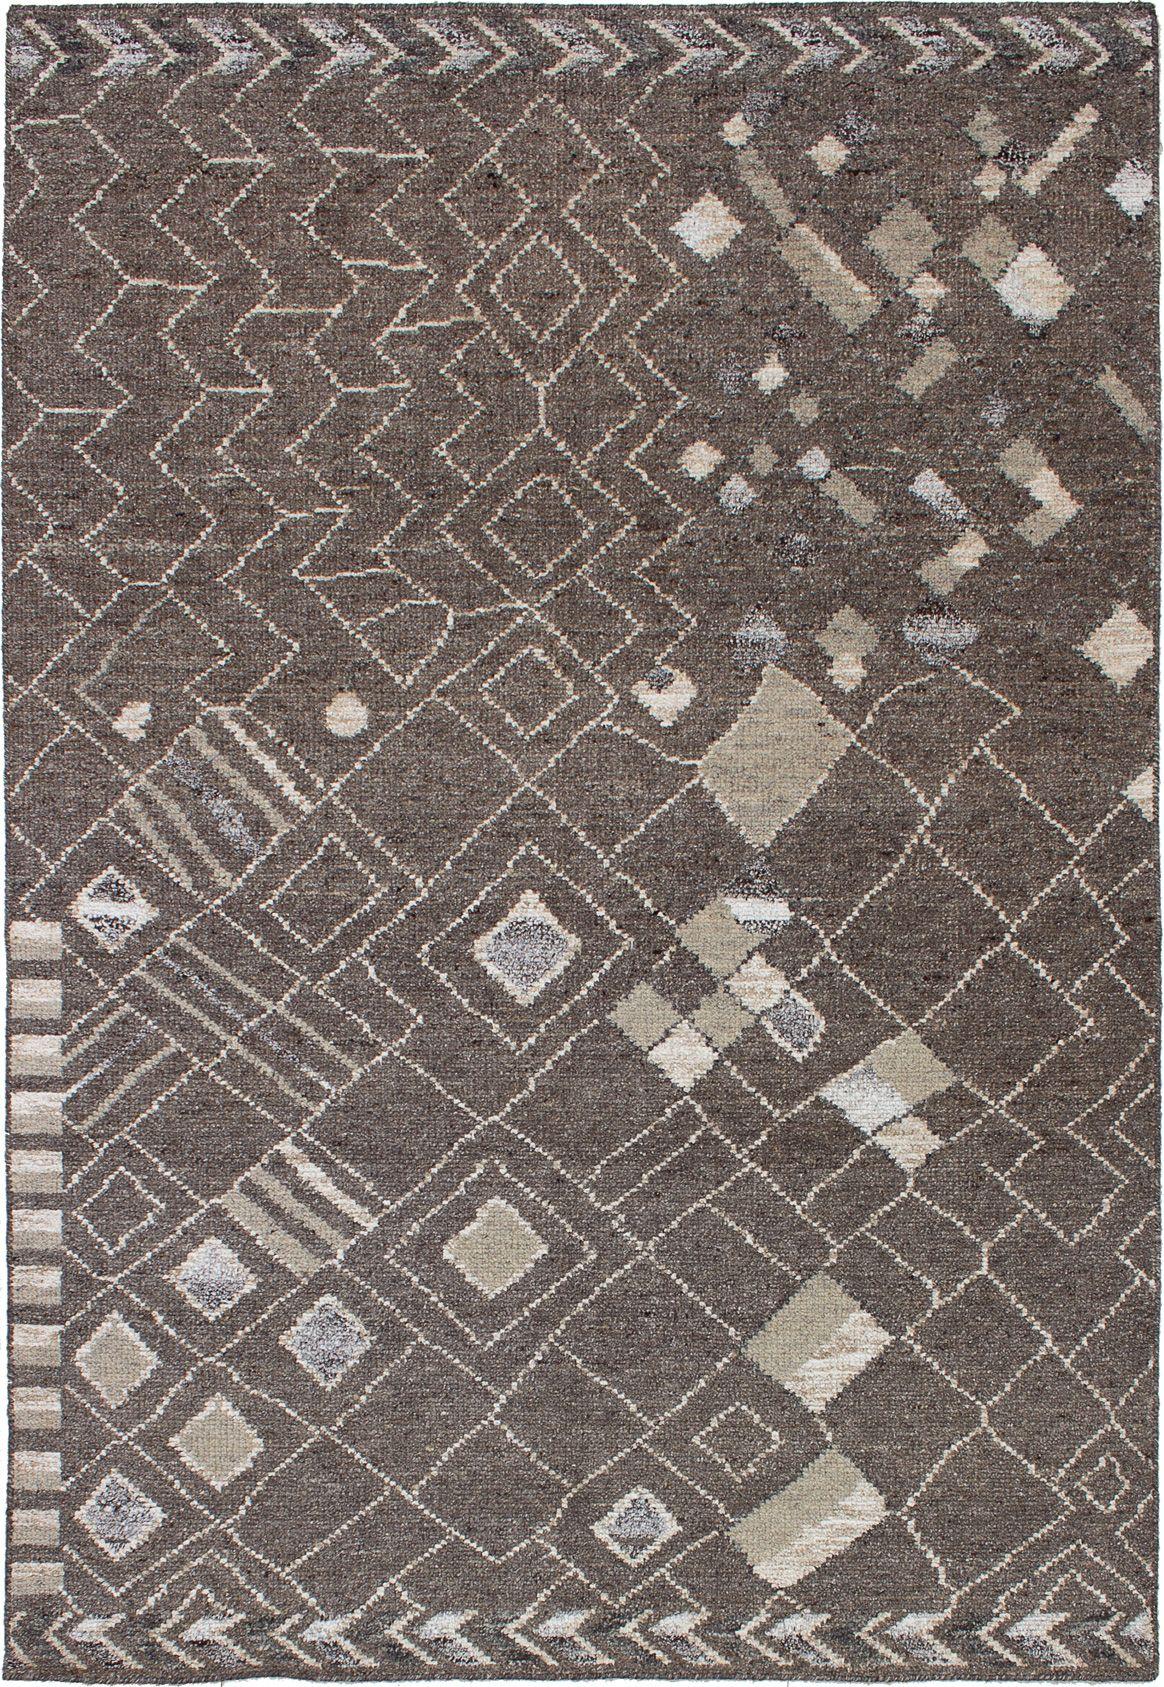 "Hand-knotted La Seda Dark Brown Wool/Silk Rug 5'3"" x 7'7"" Size: 5'3"" x 7'7"""